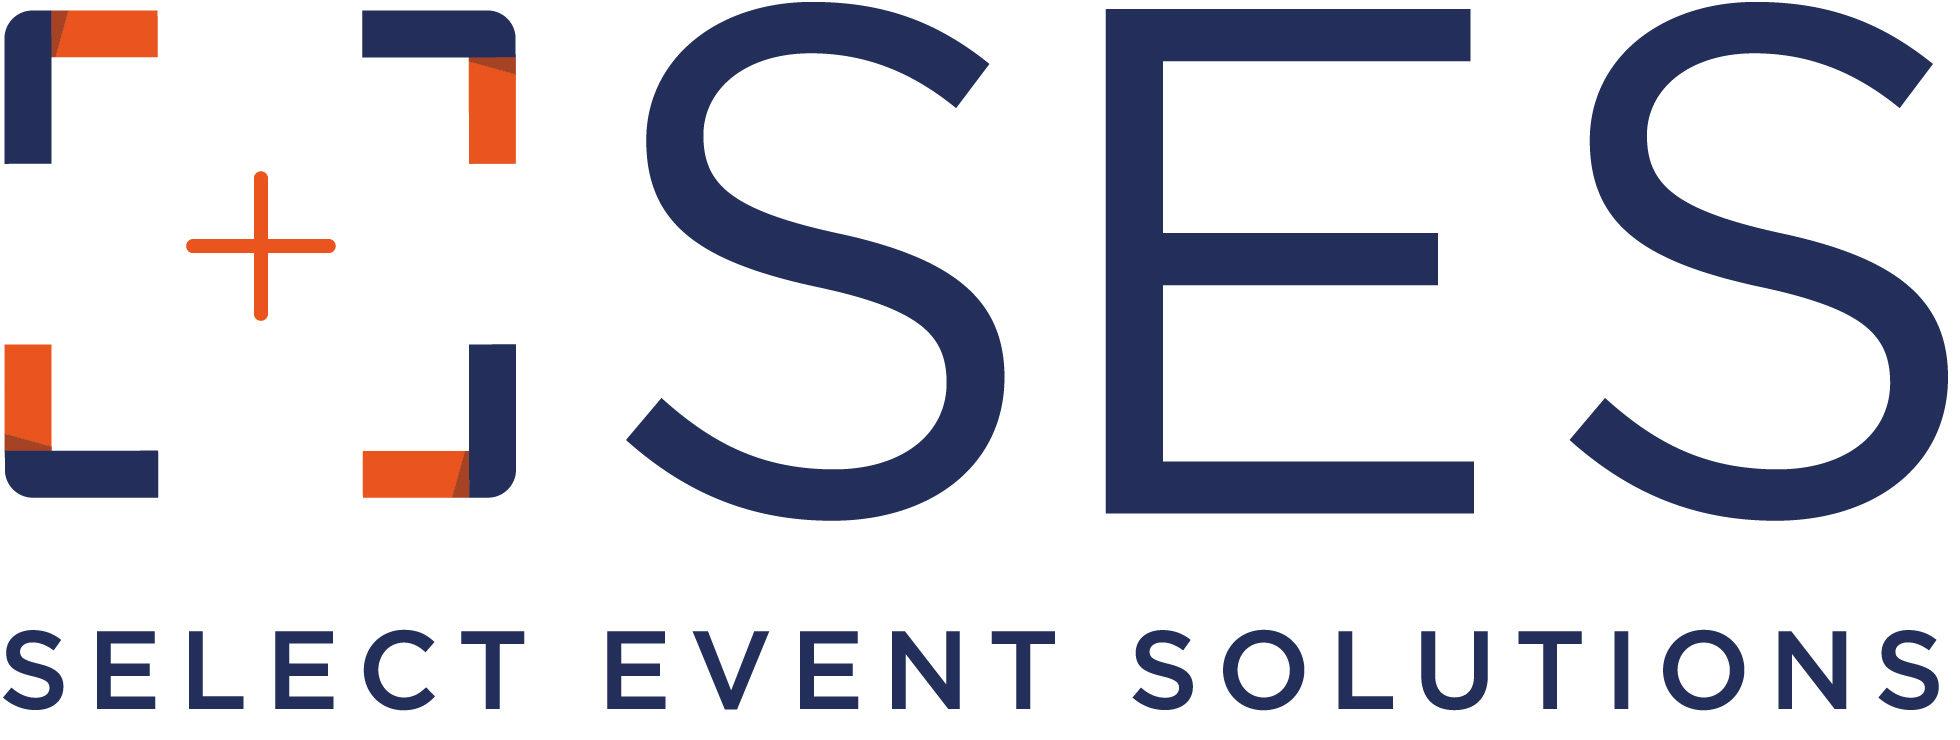 Select Event Solutions, Ltd.